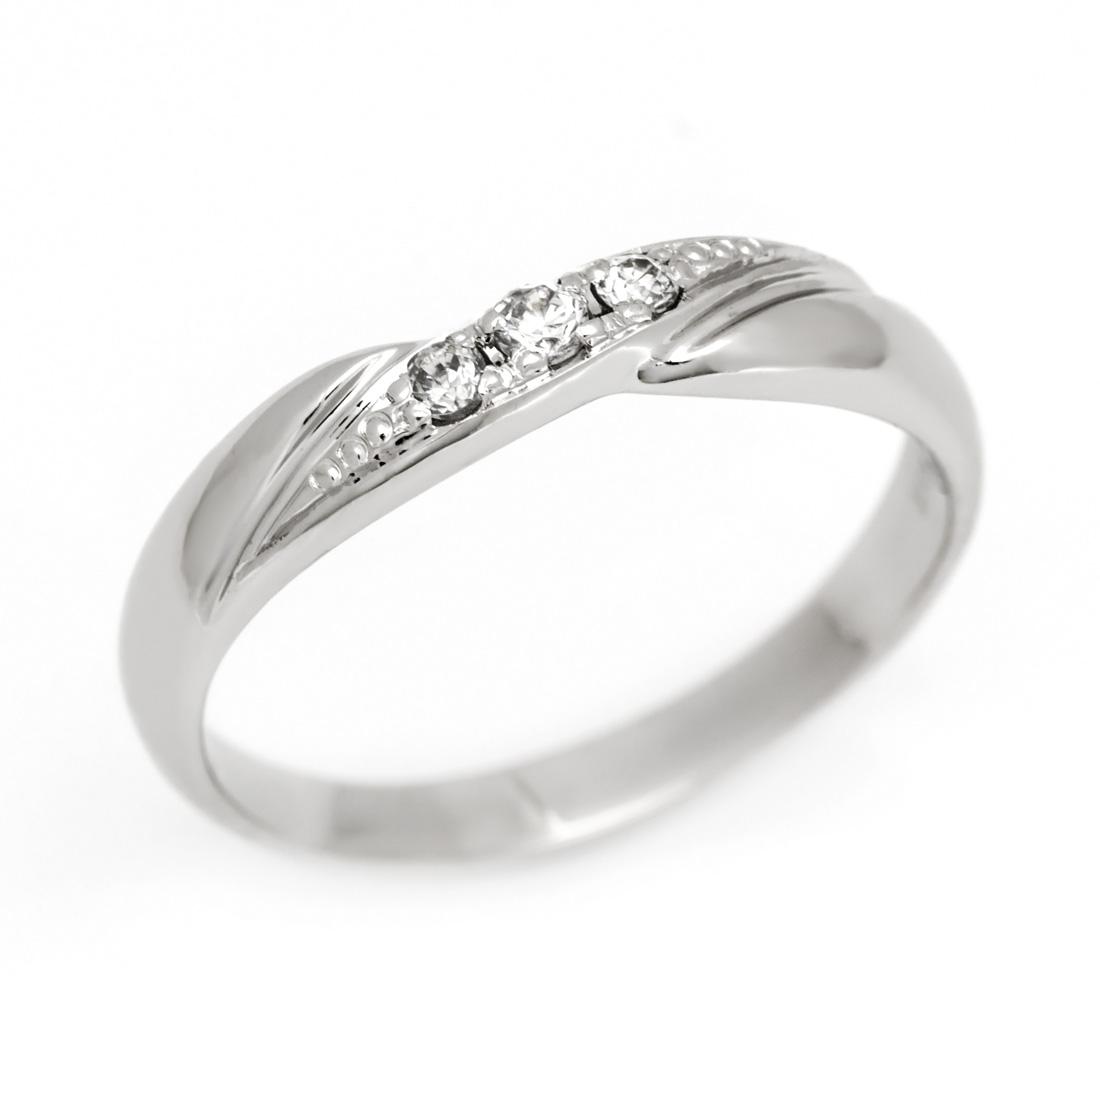 【GWクーポン配布中】マリッジリング ダイヤモンド 「Lip」 プラチナ900 (レディース:1~20号)